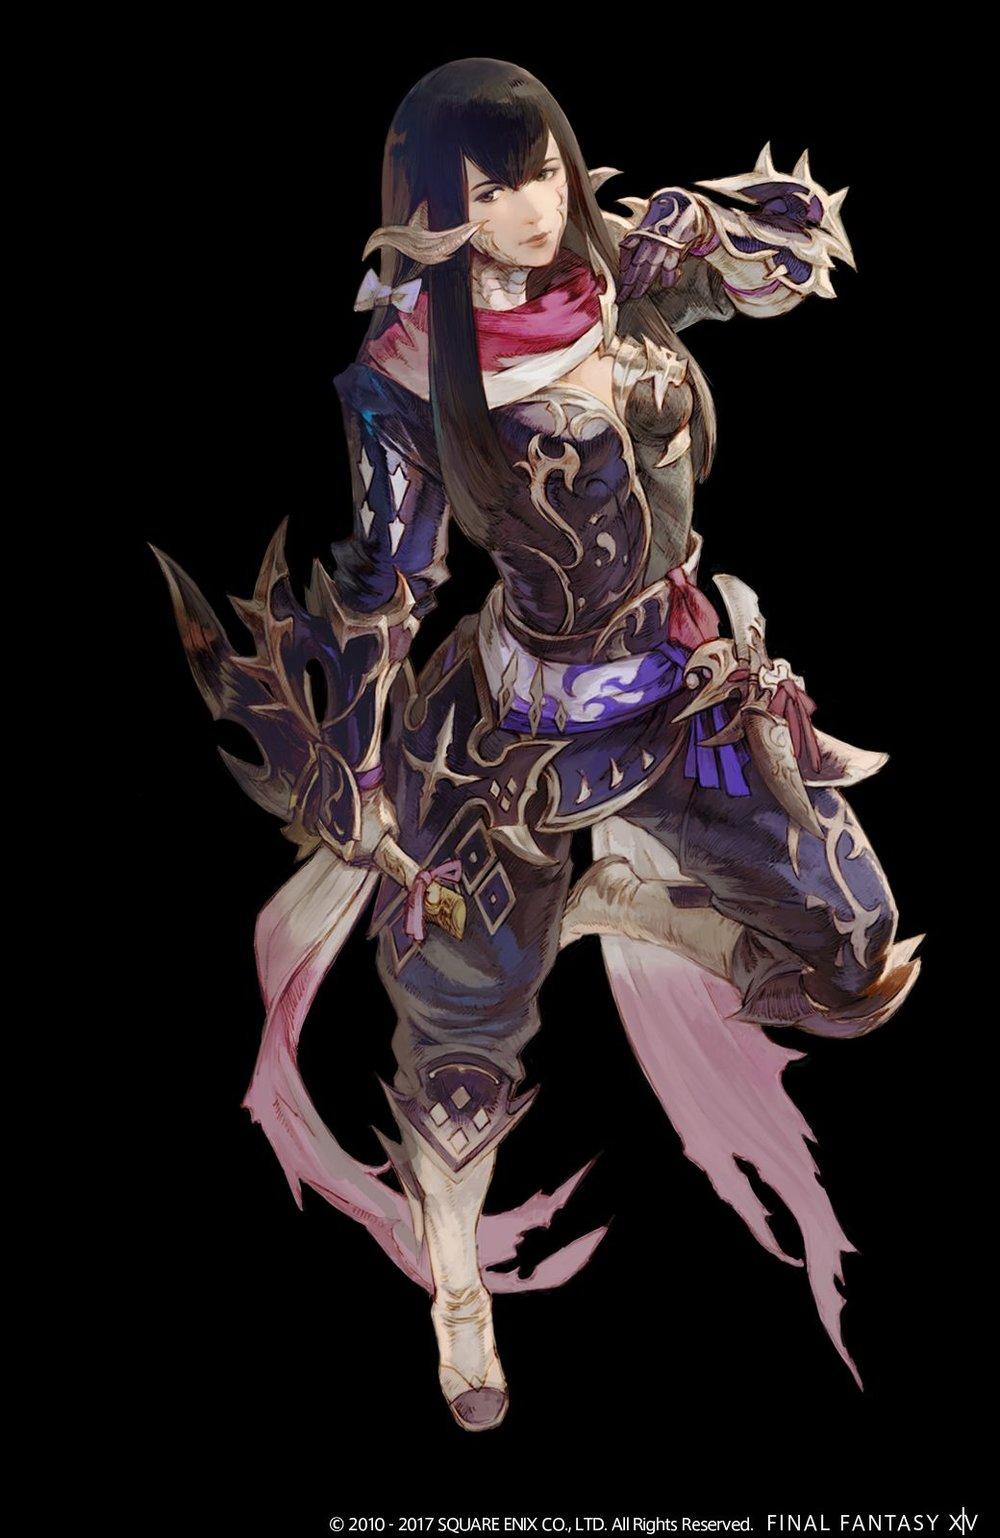 Yugiri Mistwalker - Final Fantasy XIV